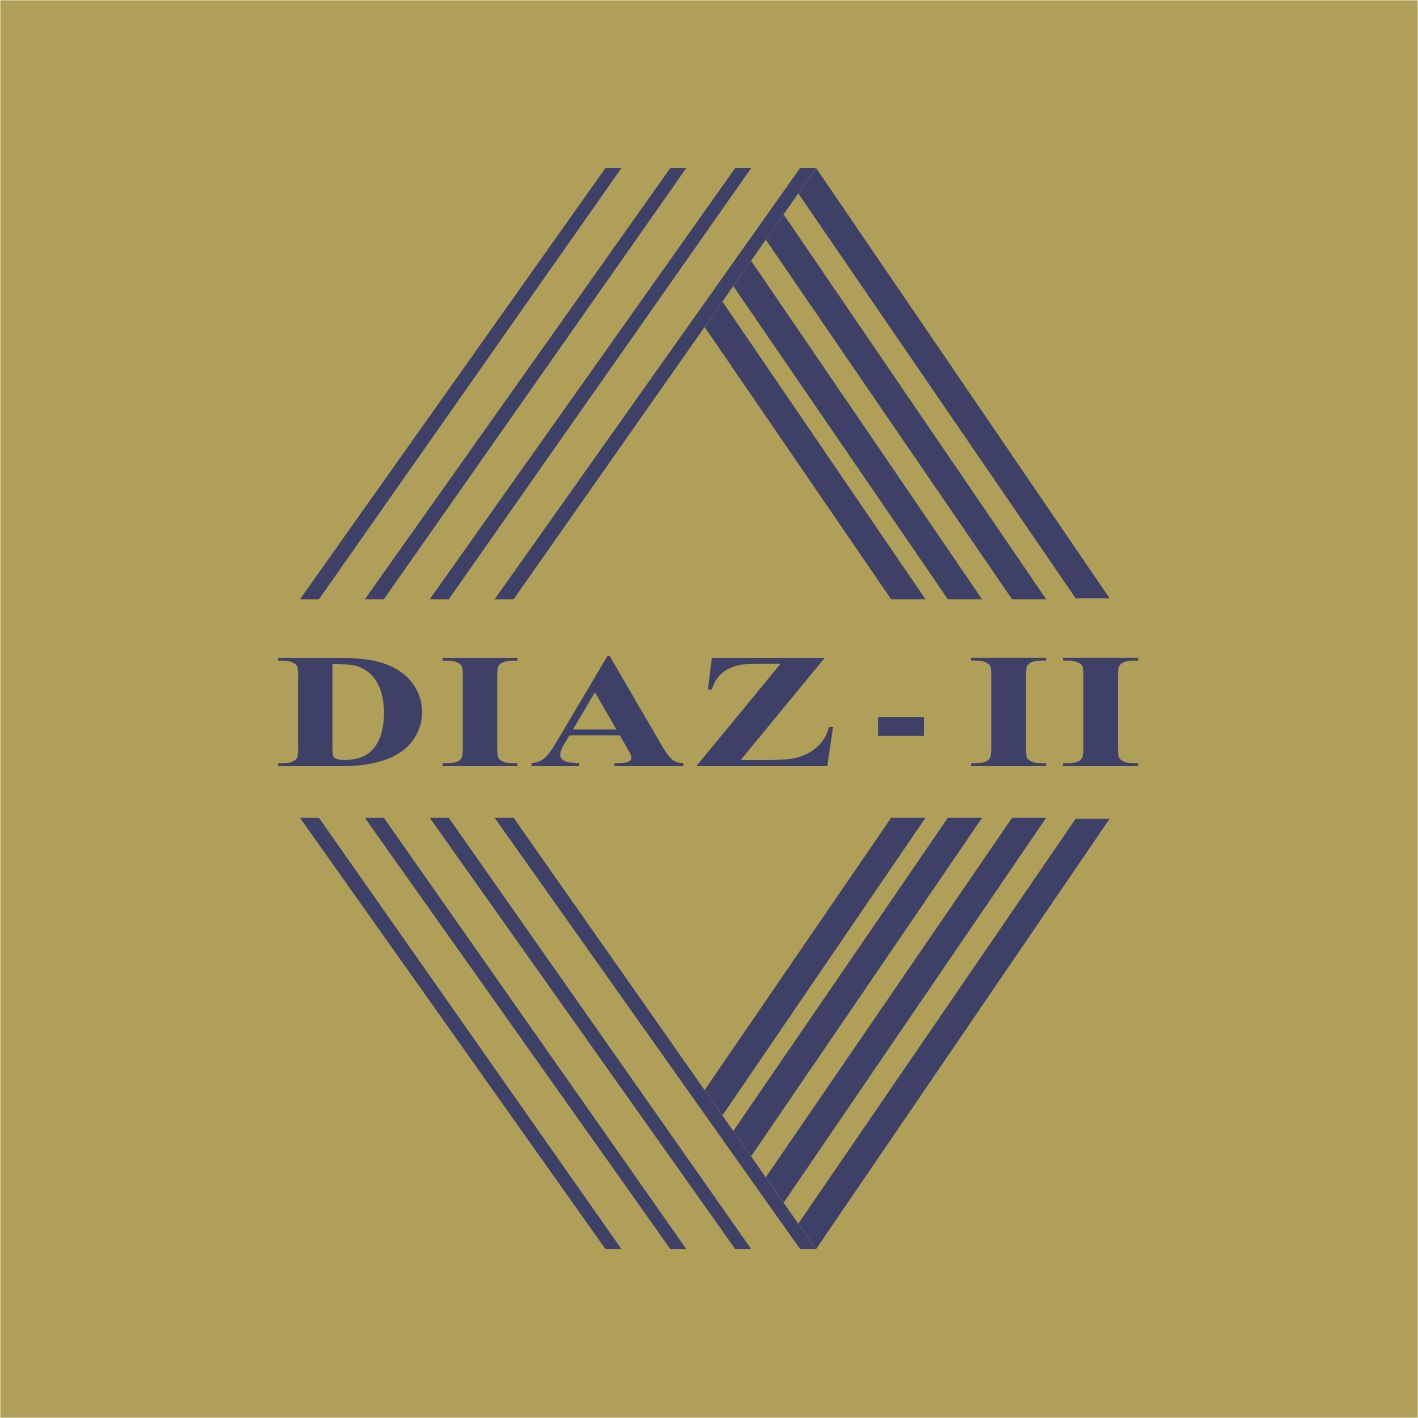 TALLERES DIAZ II